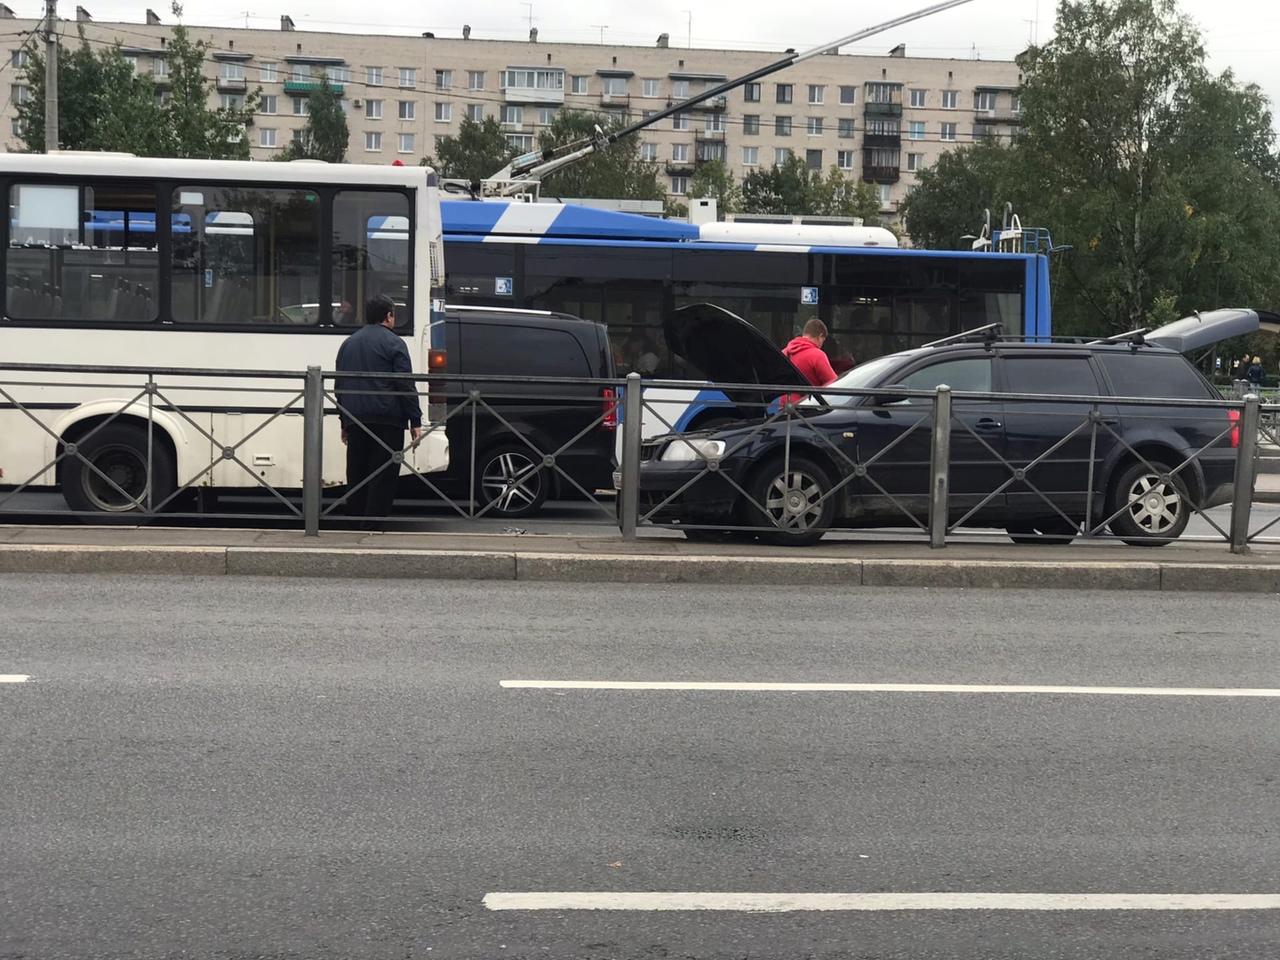 На Ветеранов у метро маршрутка притерлась с легковушкой.